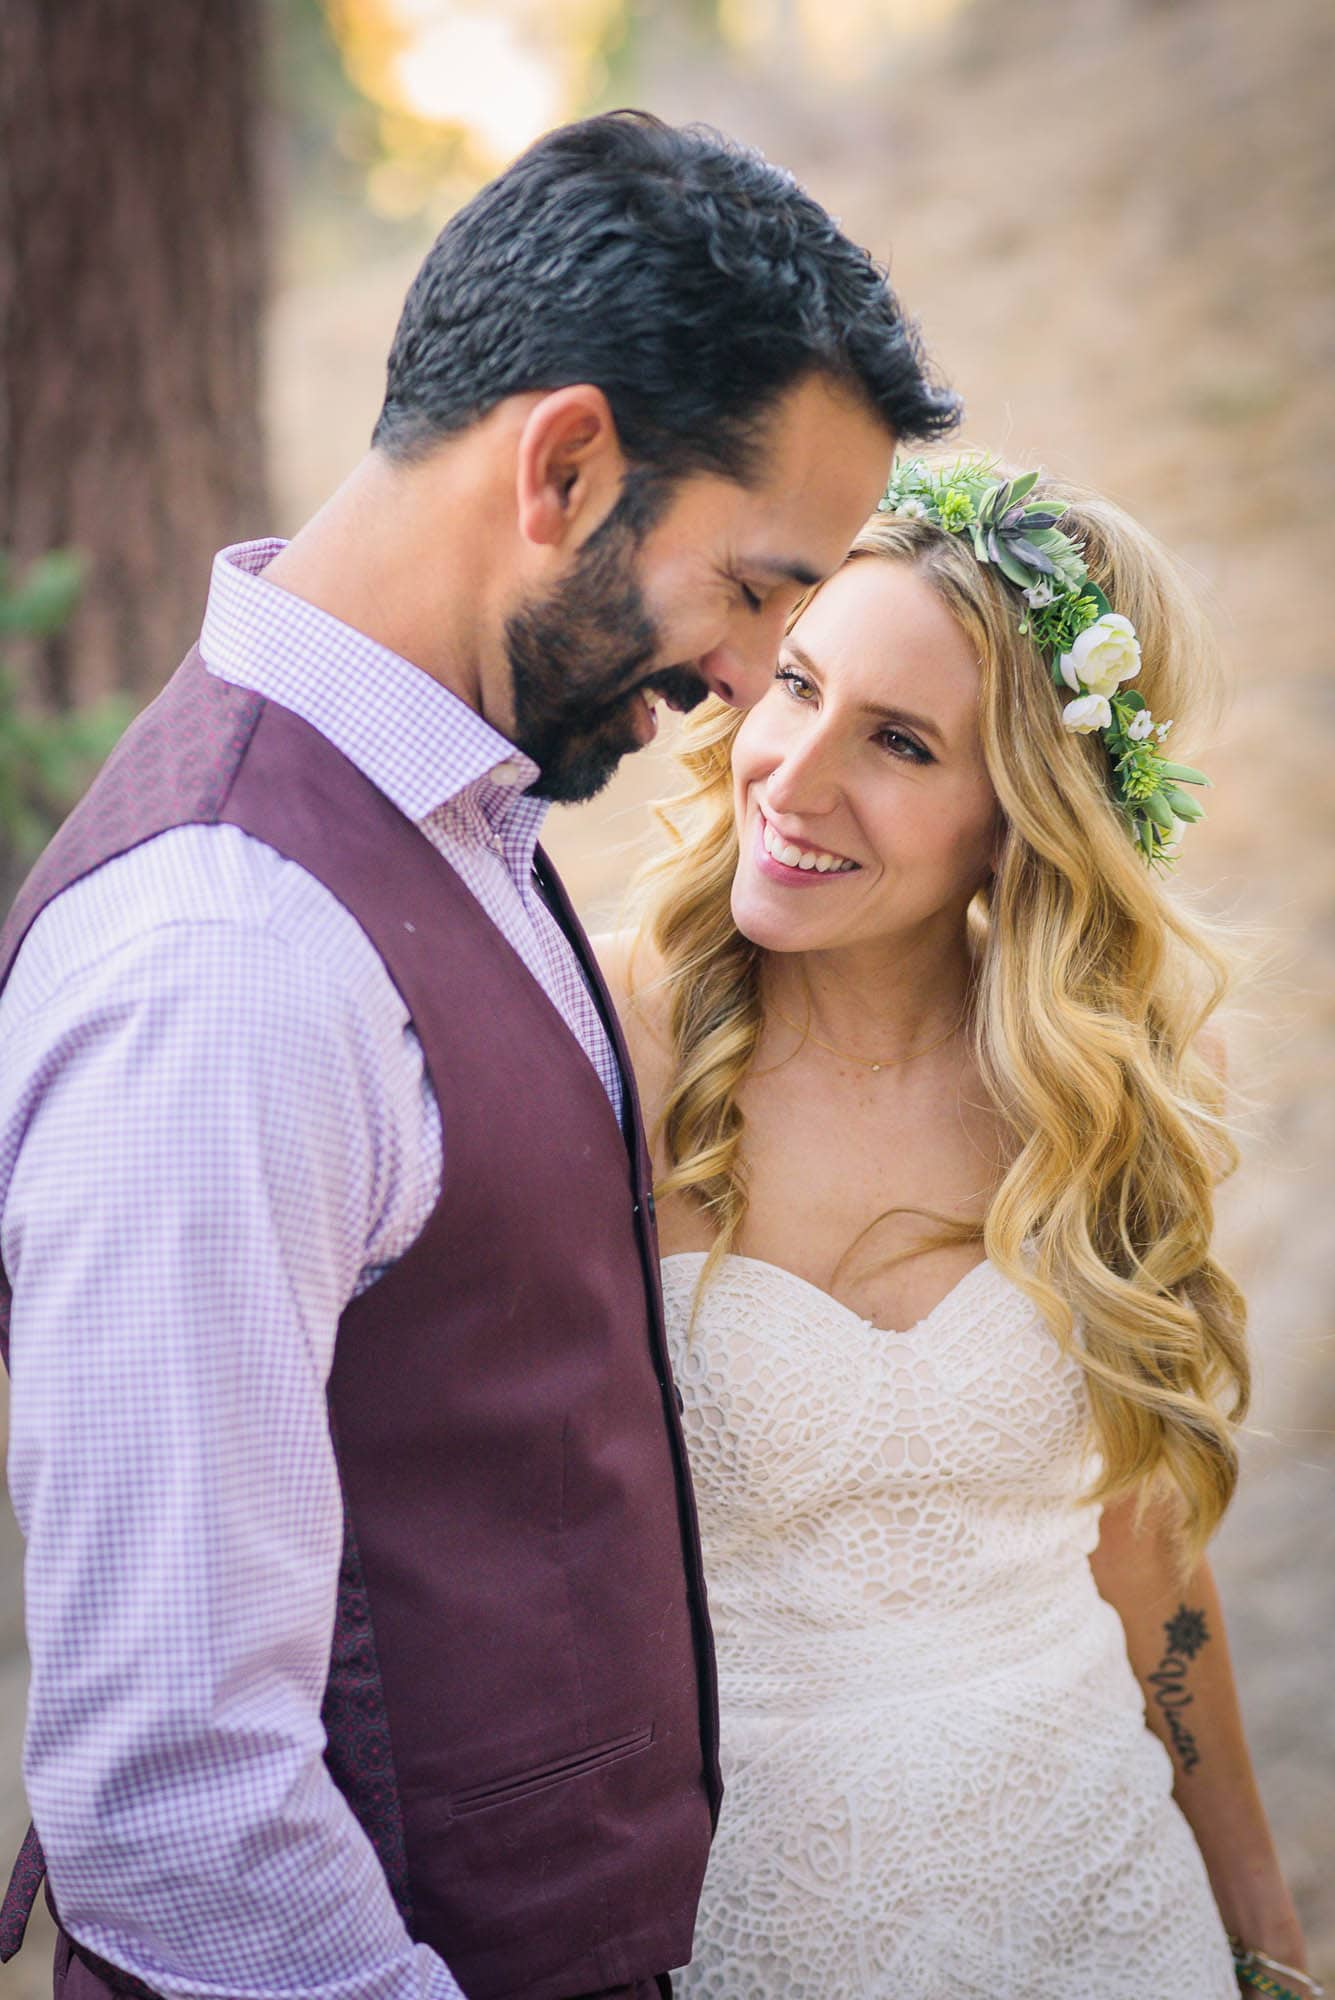 034_Alan_and_Heidi_Wedding_Natalie_Mike